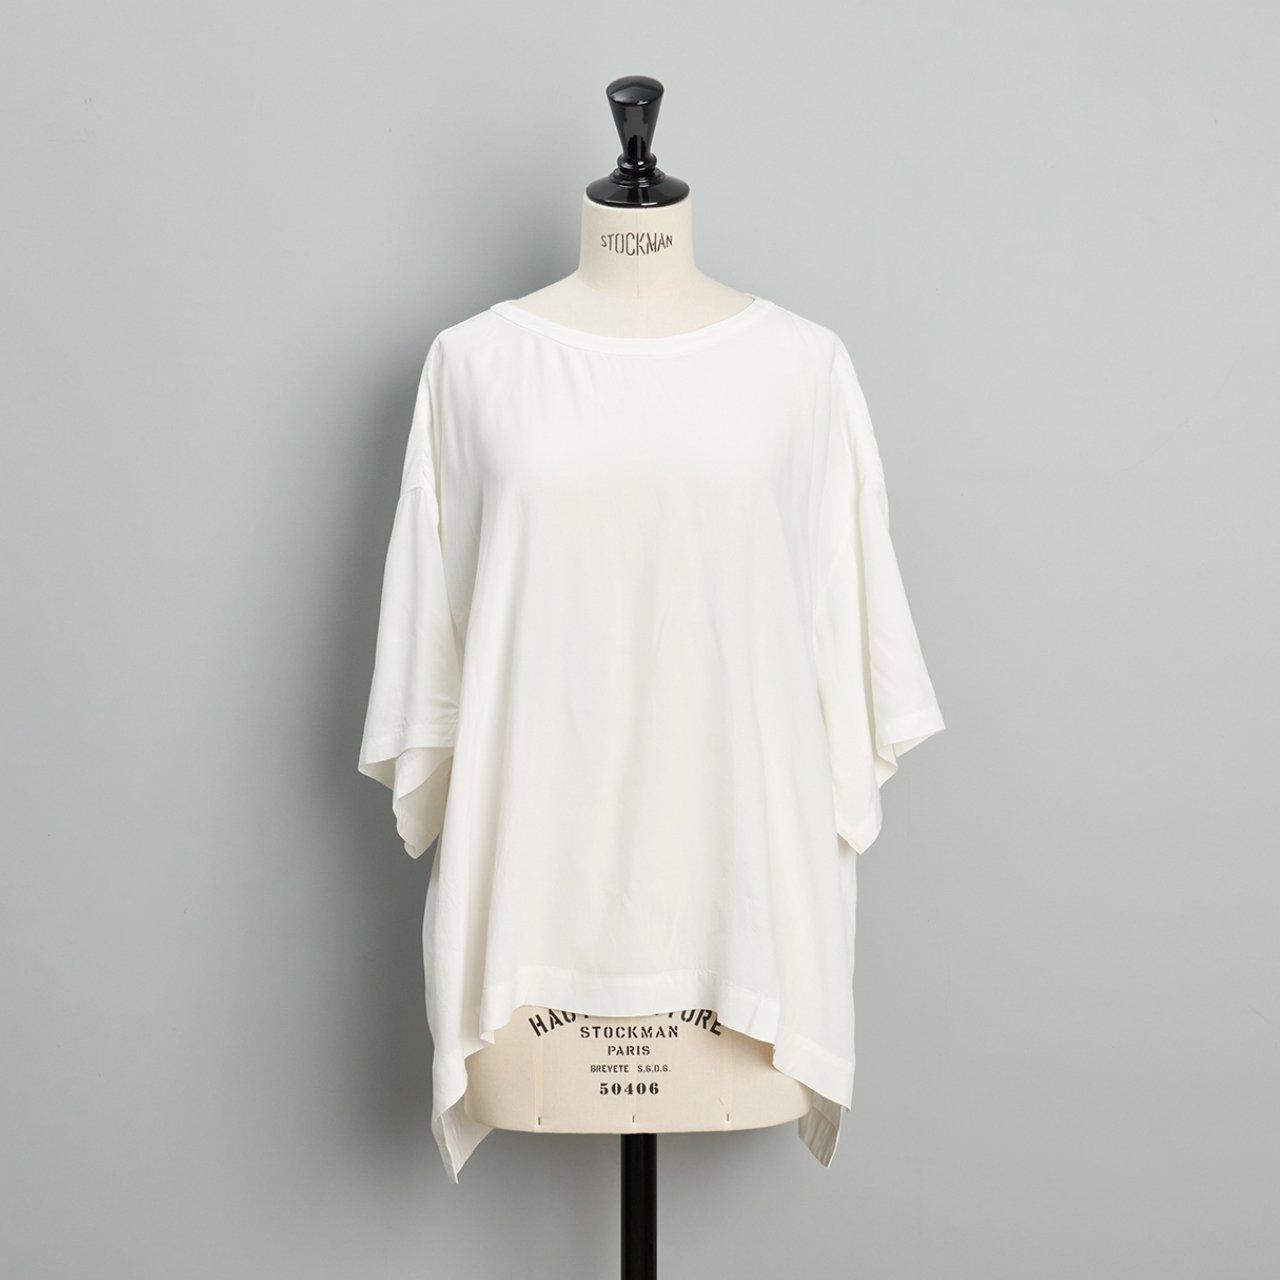 suzuki takayuki<BR>pullover blouse<BR>nude